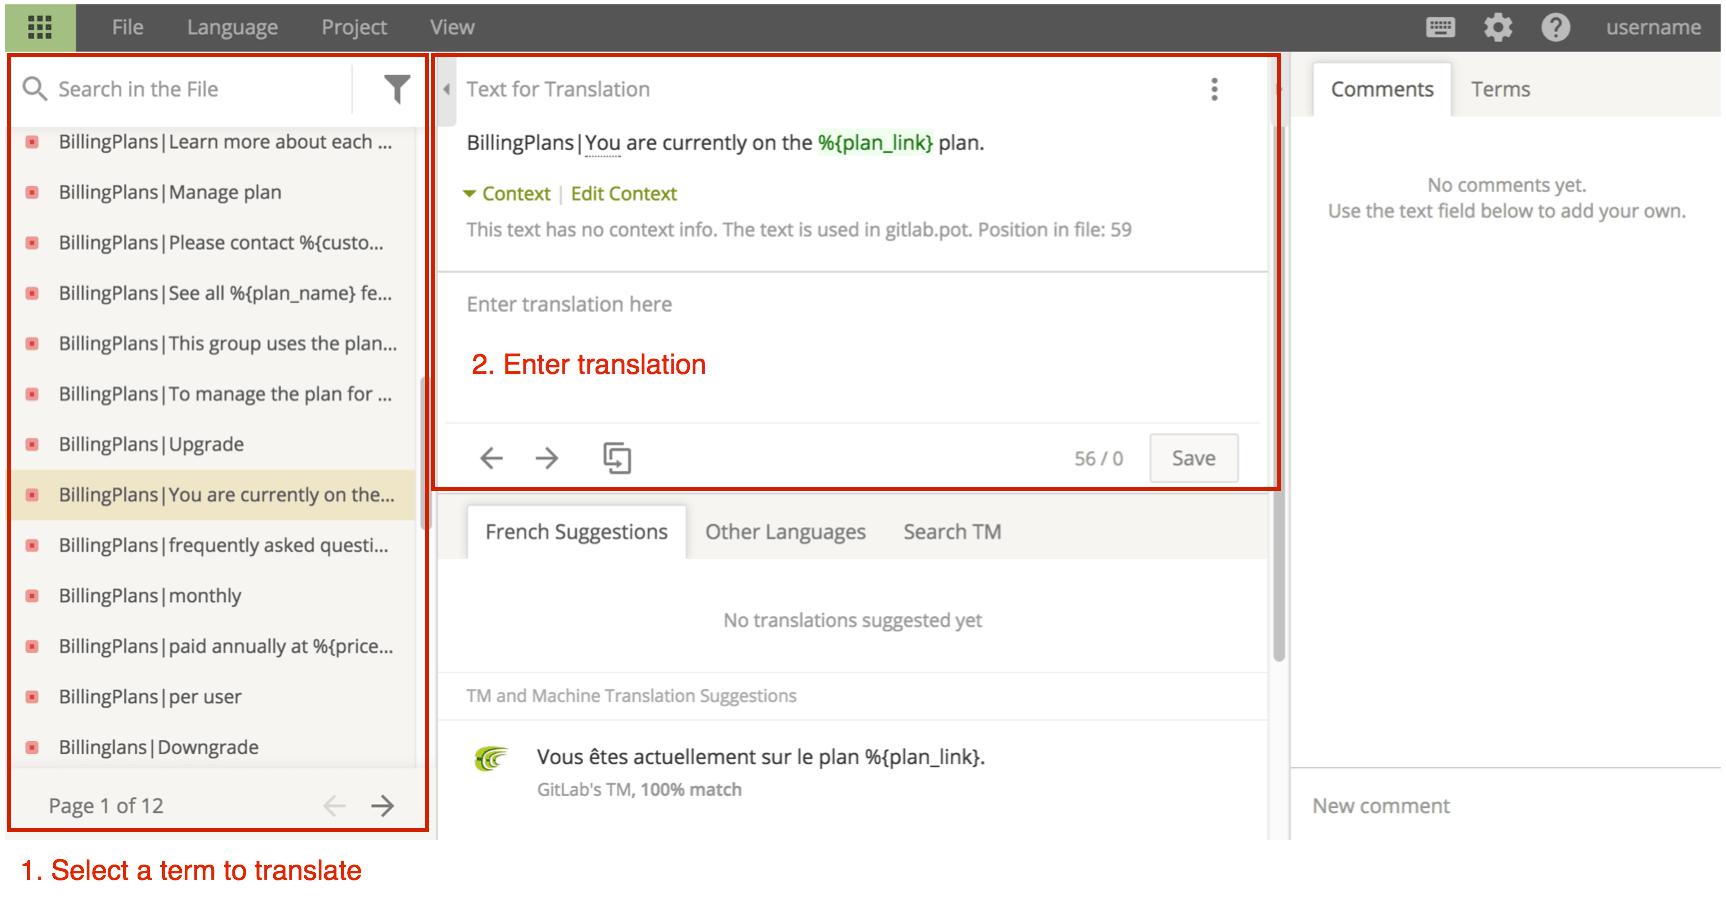 doc/development/i18n/img/crowdin-editor.png